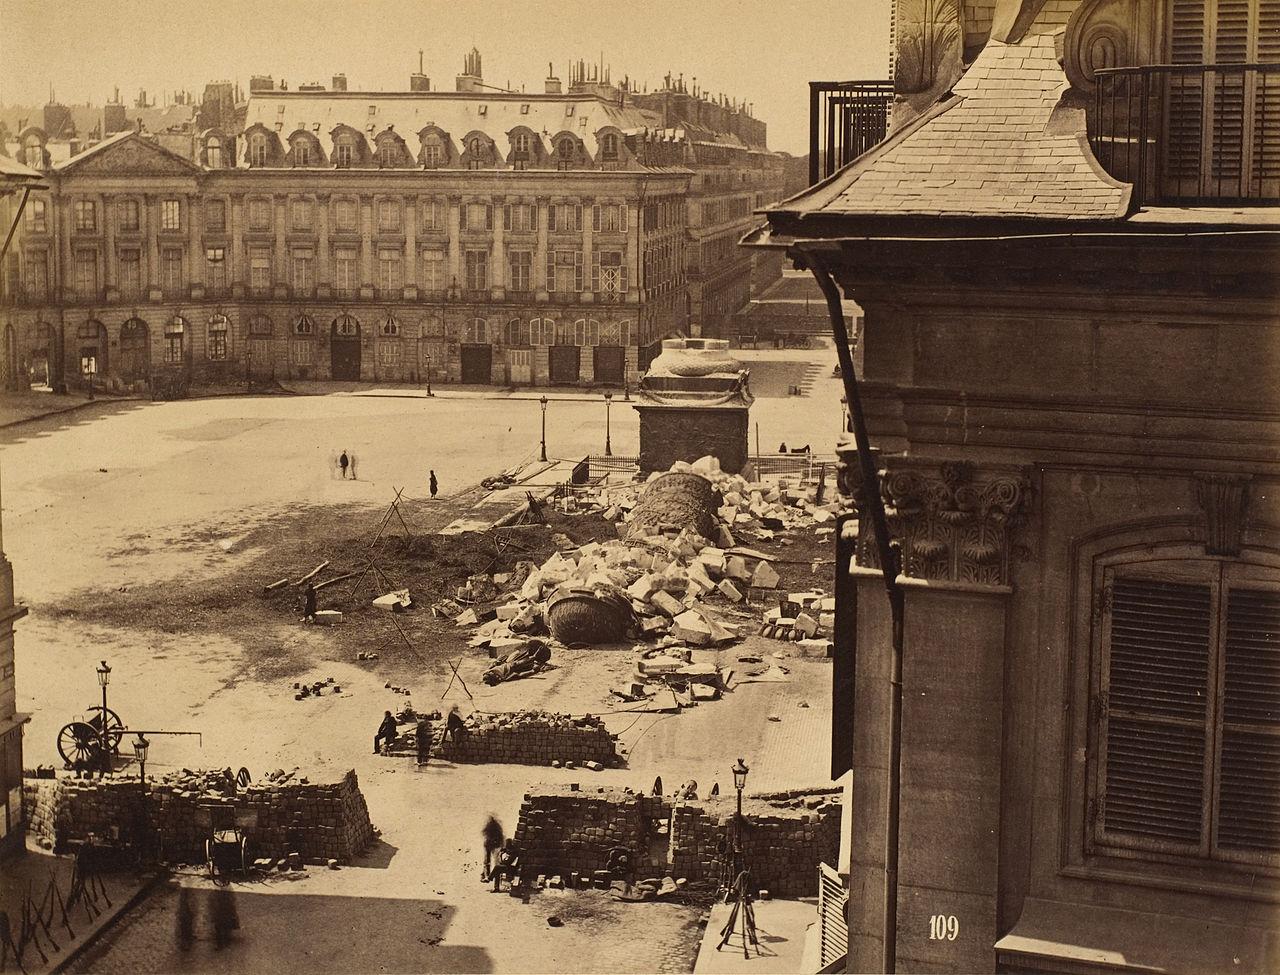 Franck,_Colonne_Vendôme,_1871.jpg